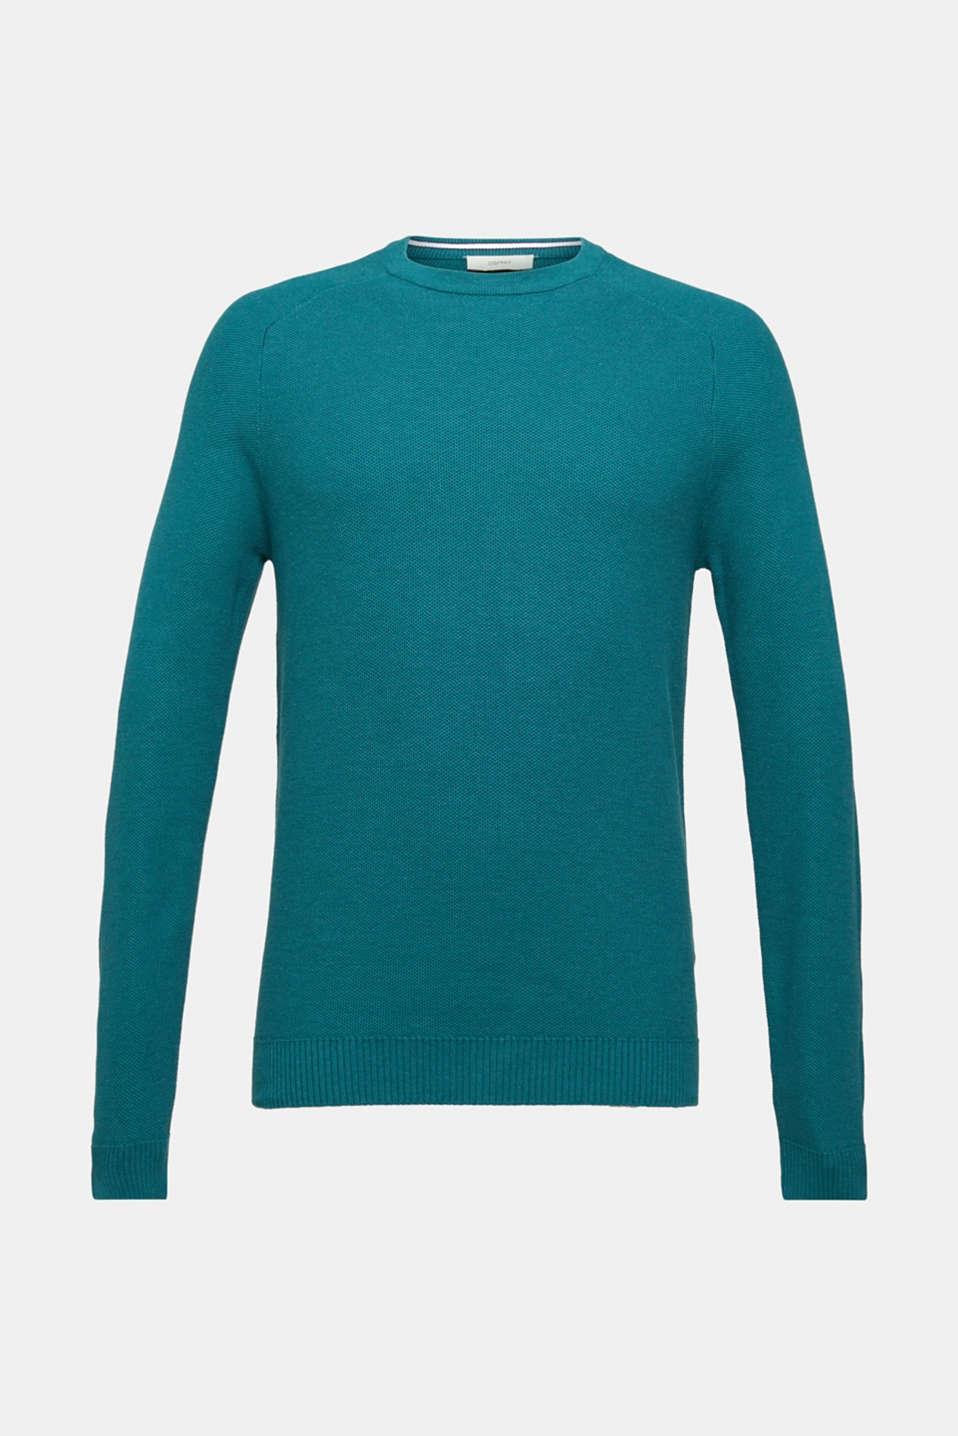 Textured jumper made of 100% cotton, TEAL BLUE 5, detail image number 6